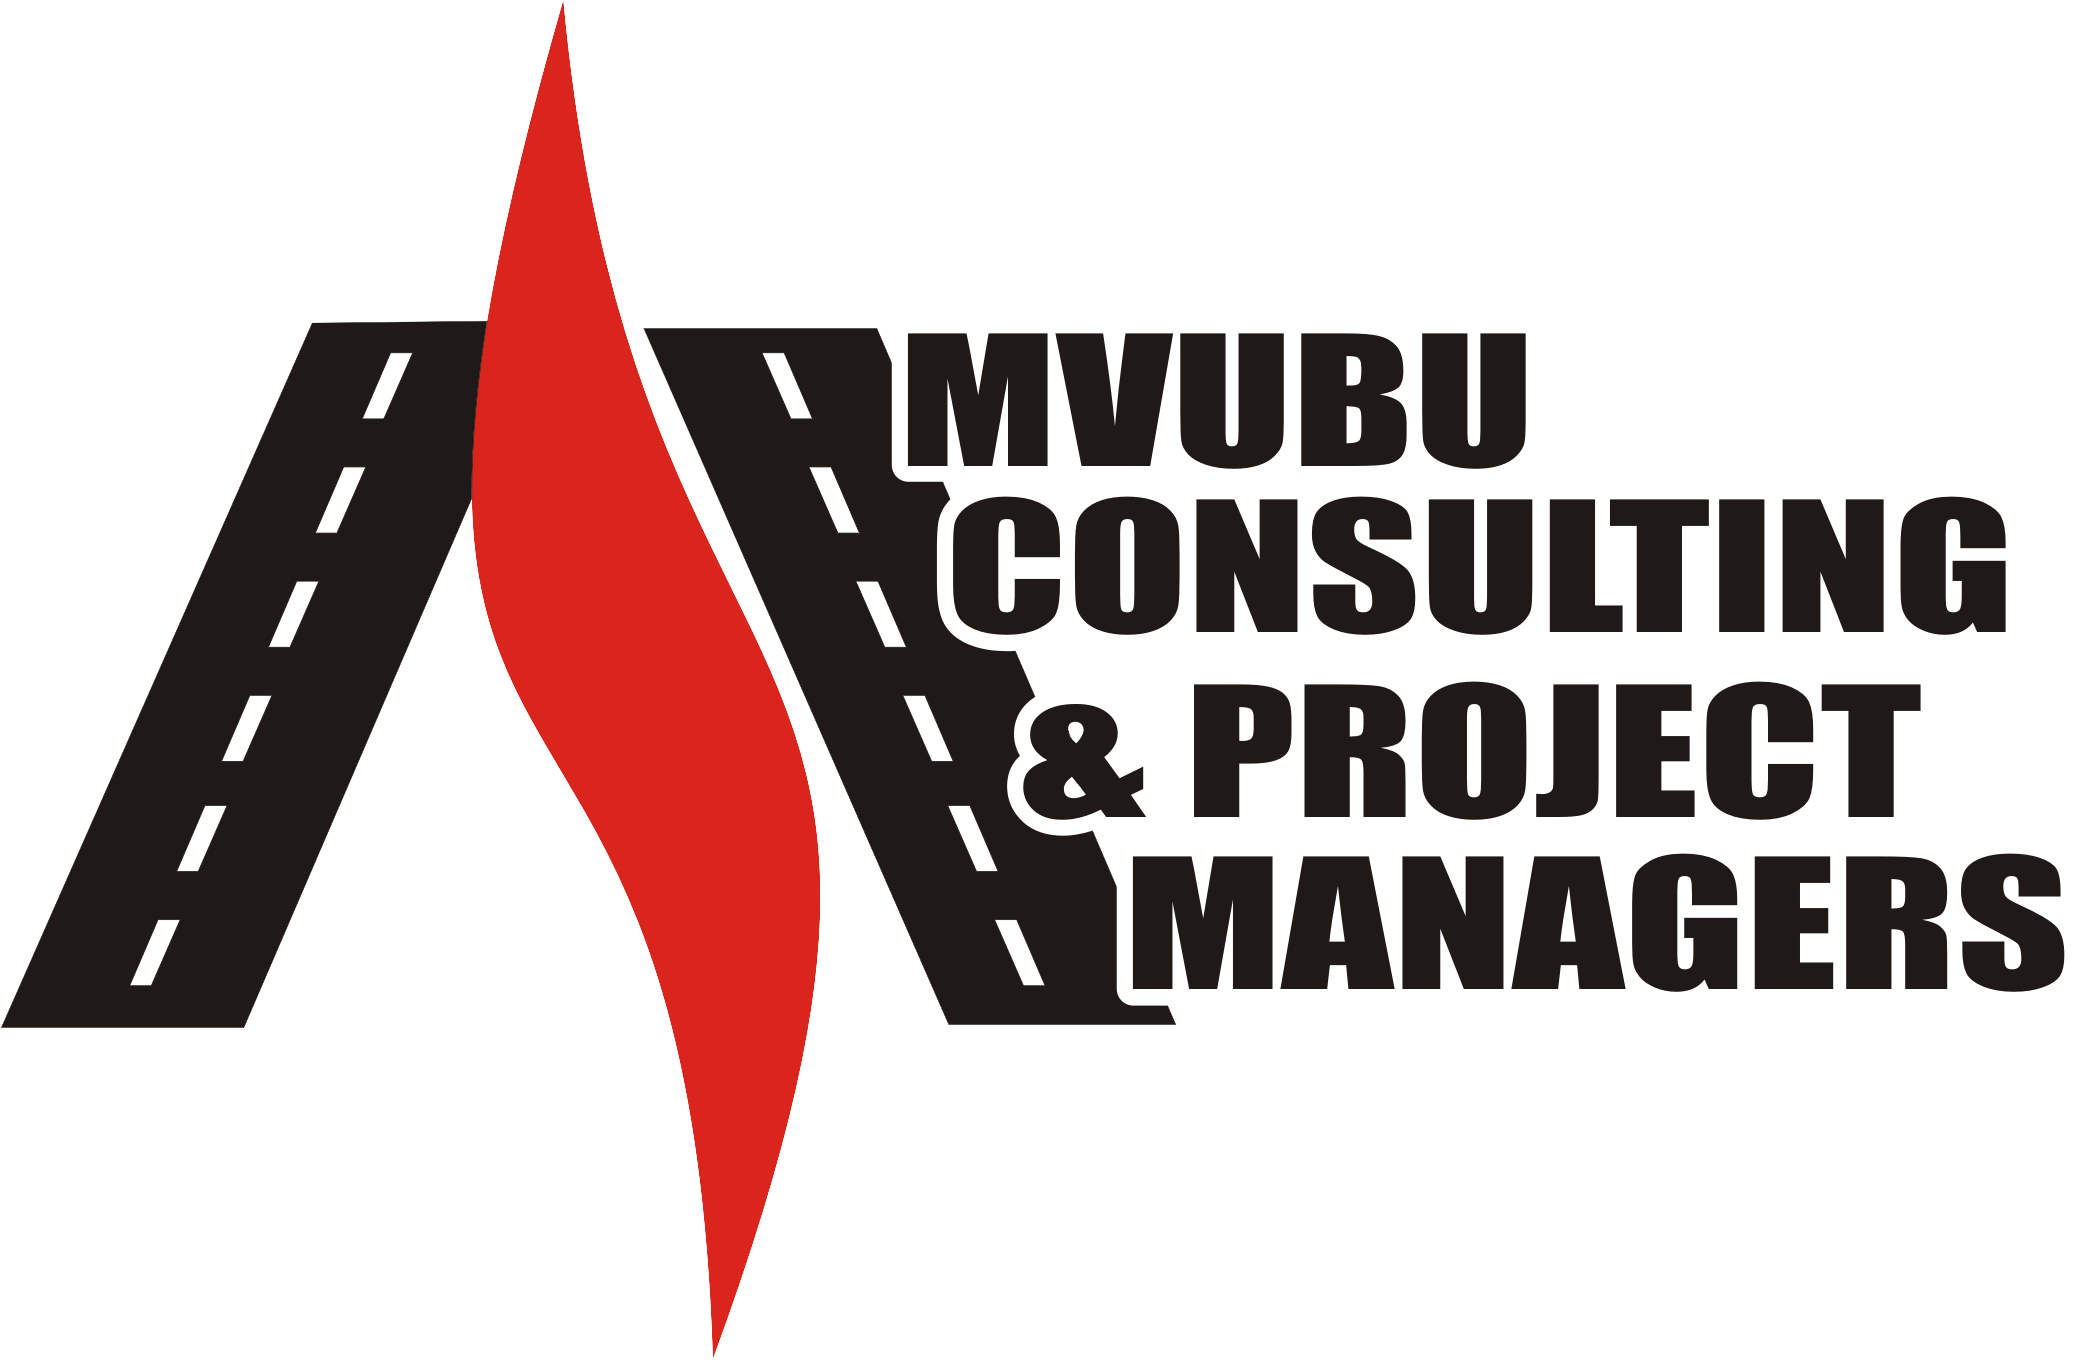 Mvubu Consulting